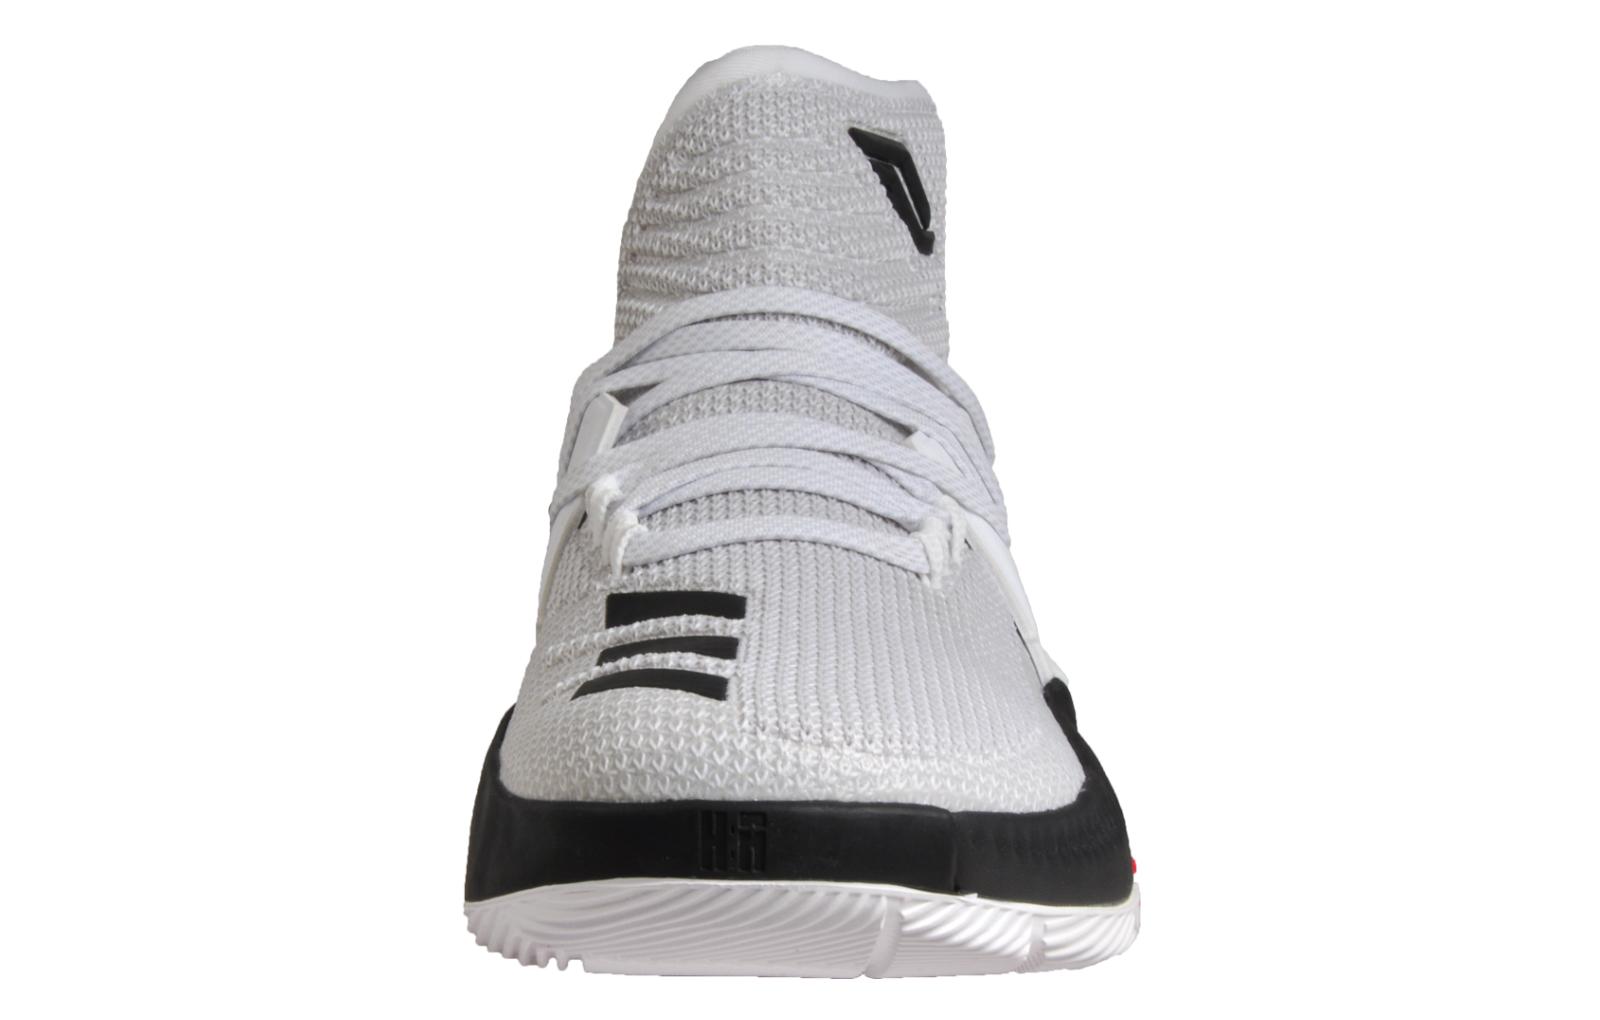 cheaper f14be b9ca7 Adidas Damian Lillard 3 Mens Crazy Time Basketball CourtTrainers White